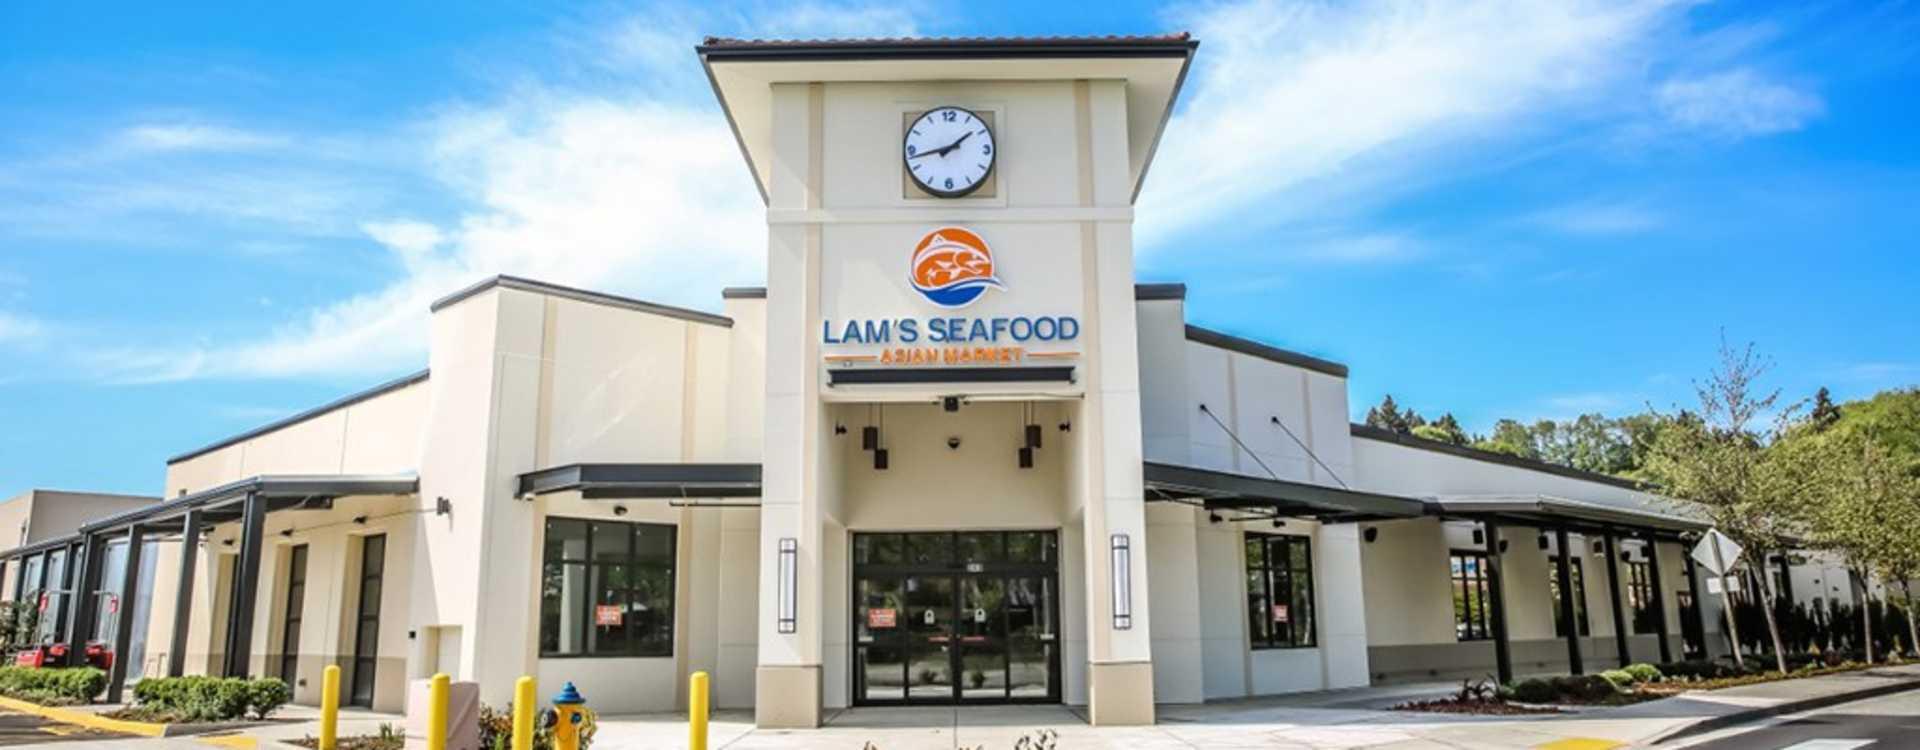 Lam's Seafood Asian Market